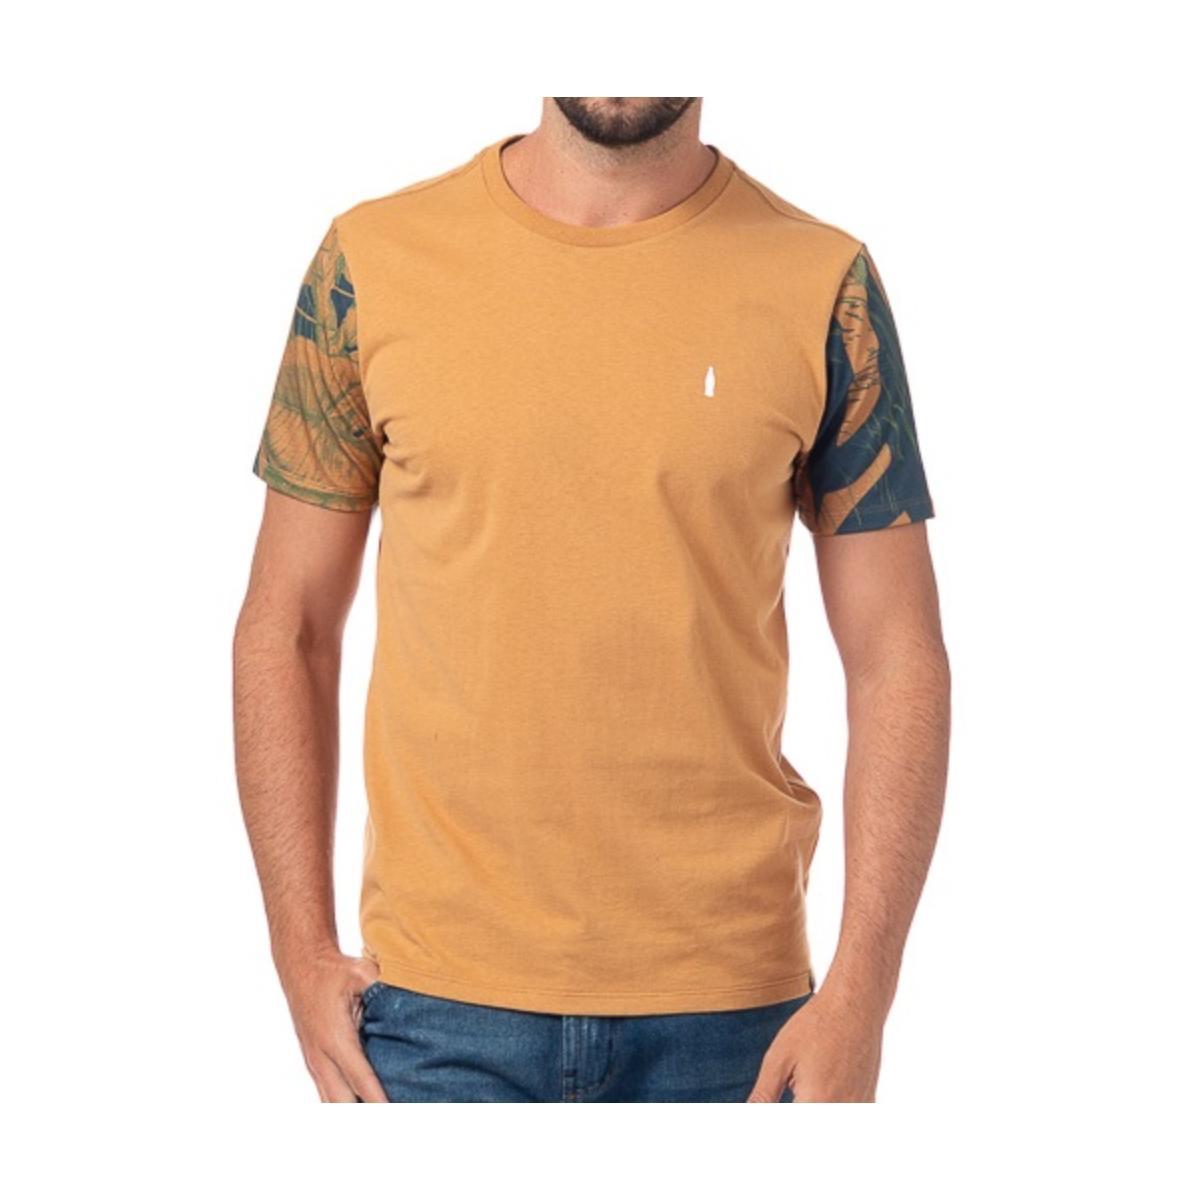 Camiseta Masculina Coca-cola Clothing 353207304 Vb267 Marrom